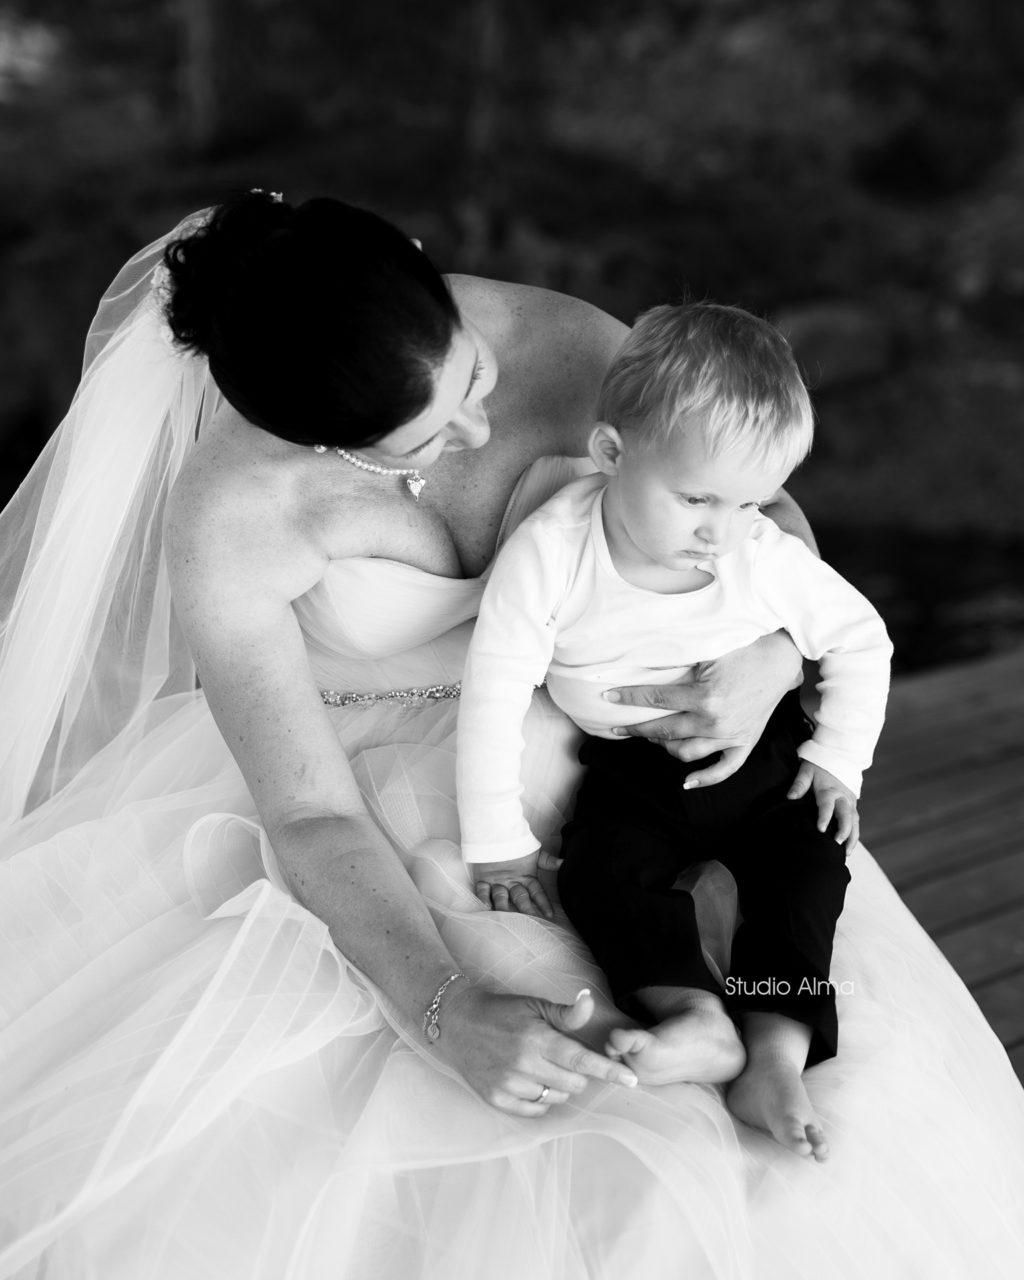 brud-familie-bryllup-studioalma